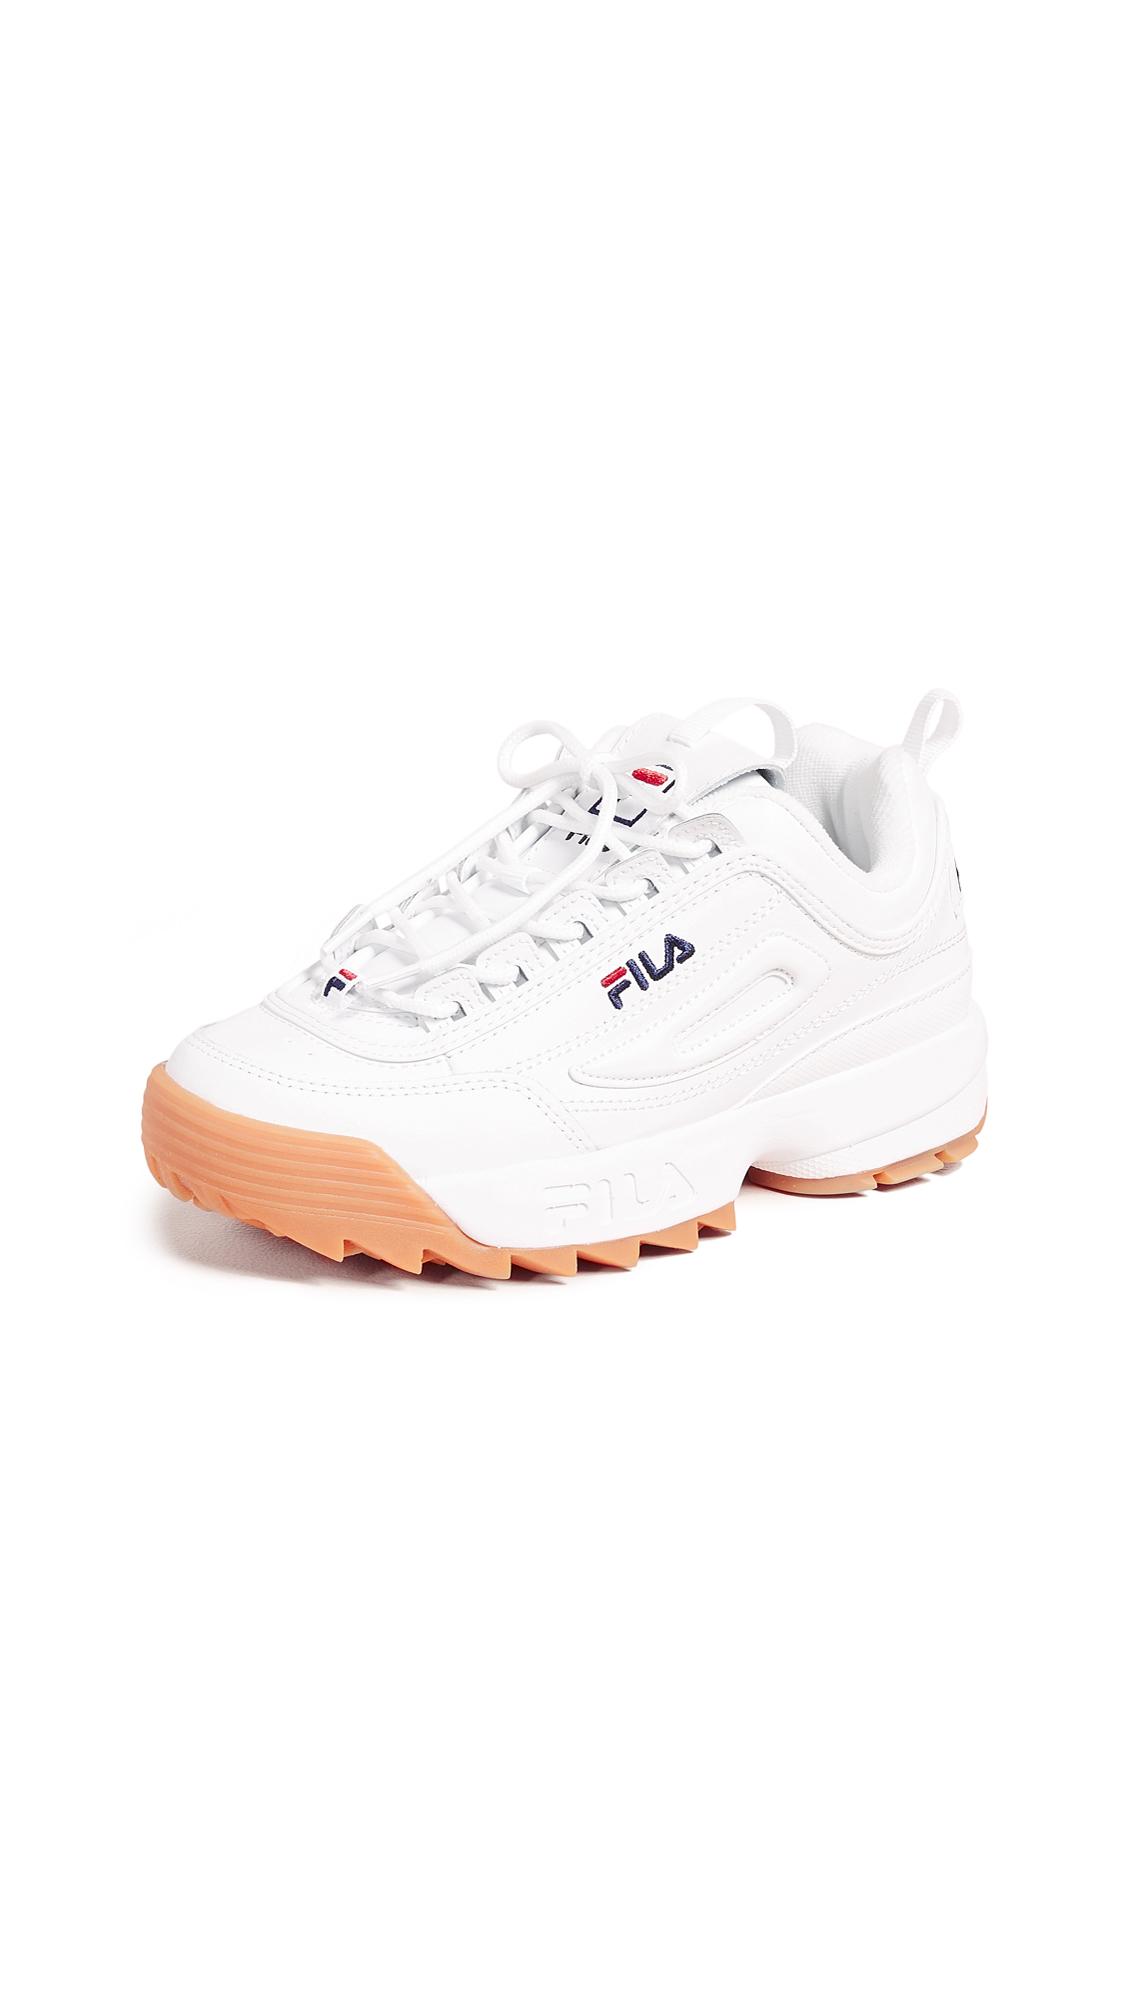 Fila Disruptor II Premium Sneakers - White/Fila Navy/Gum